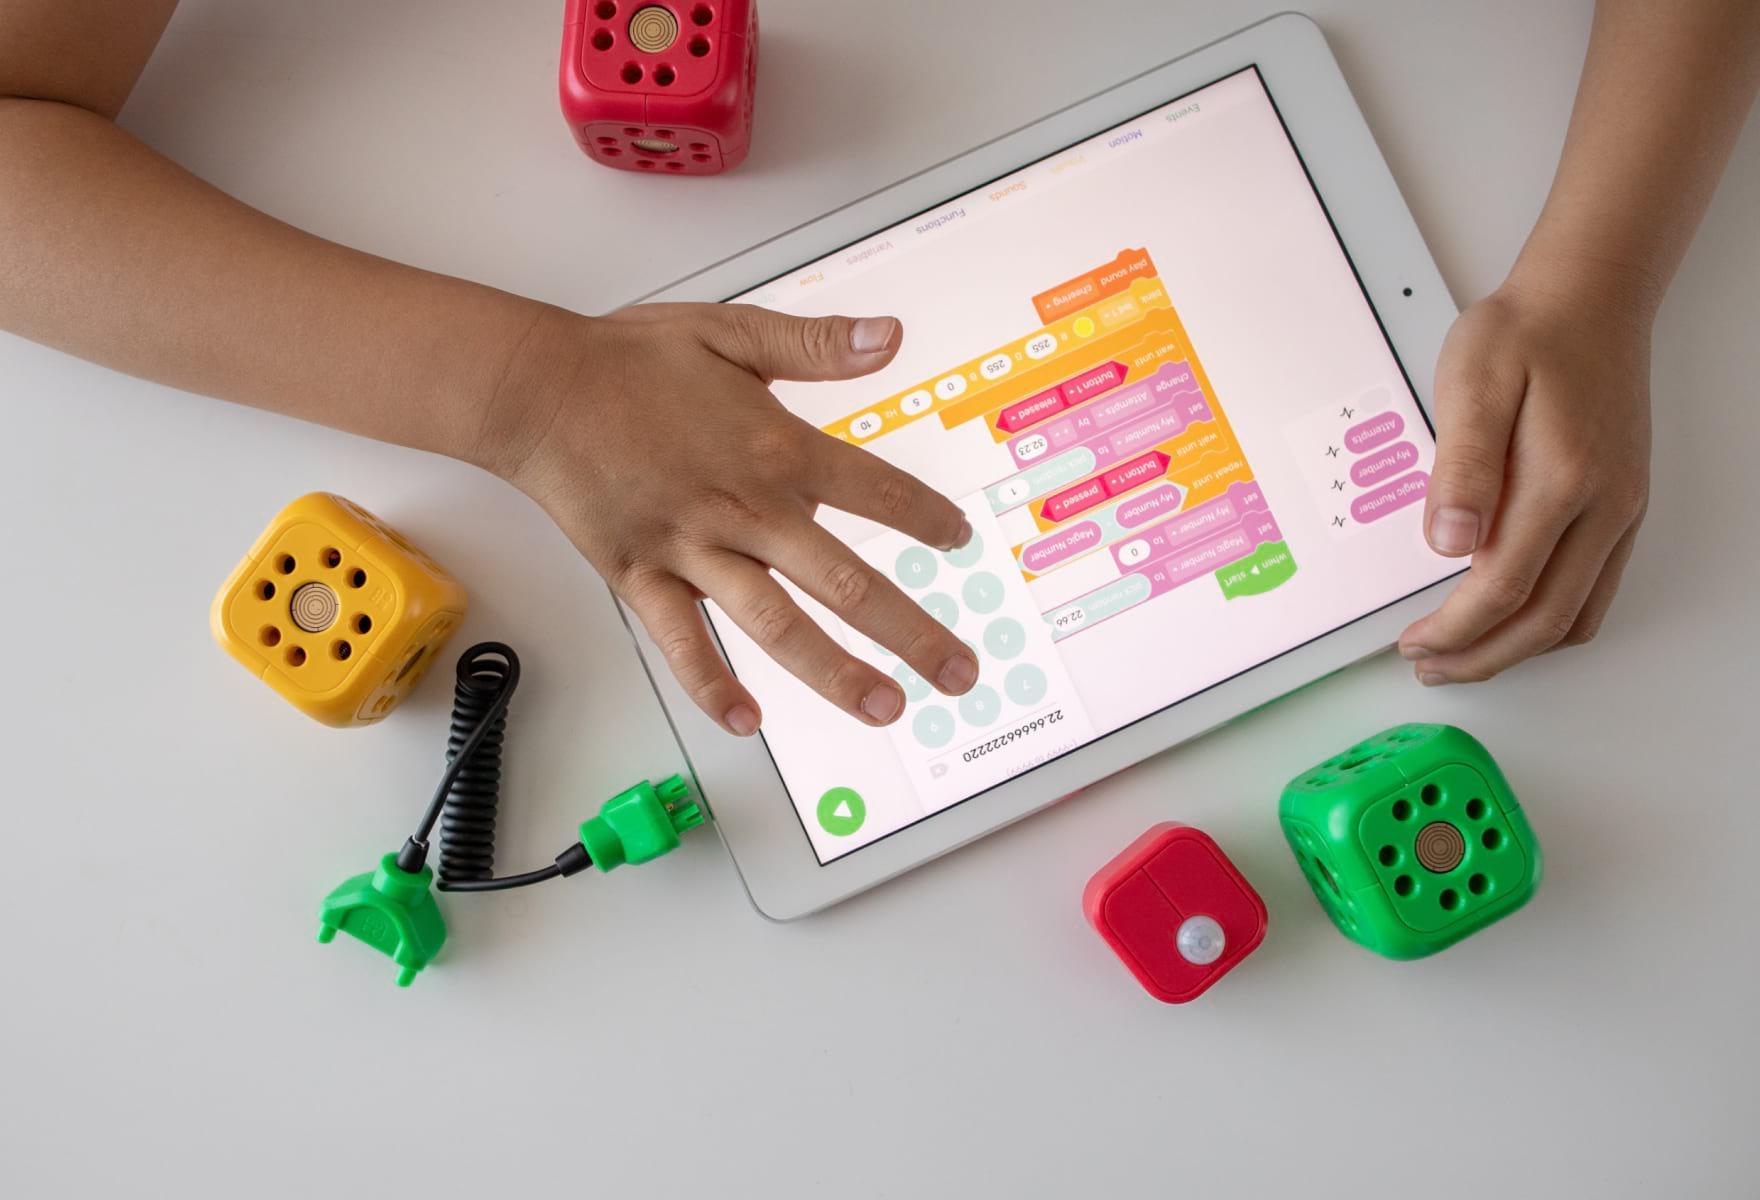 How coding teaches kids 21st century skills